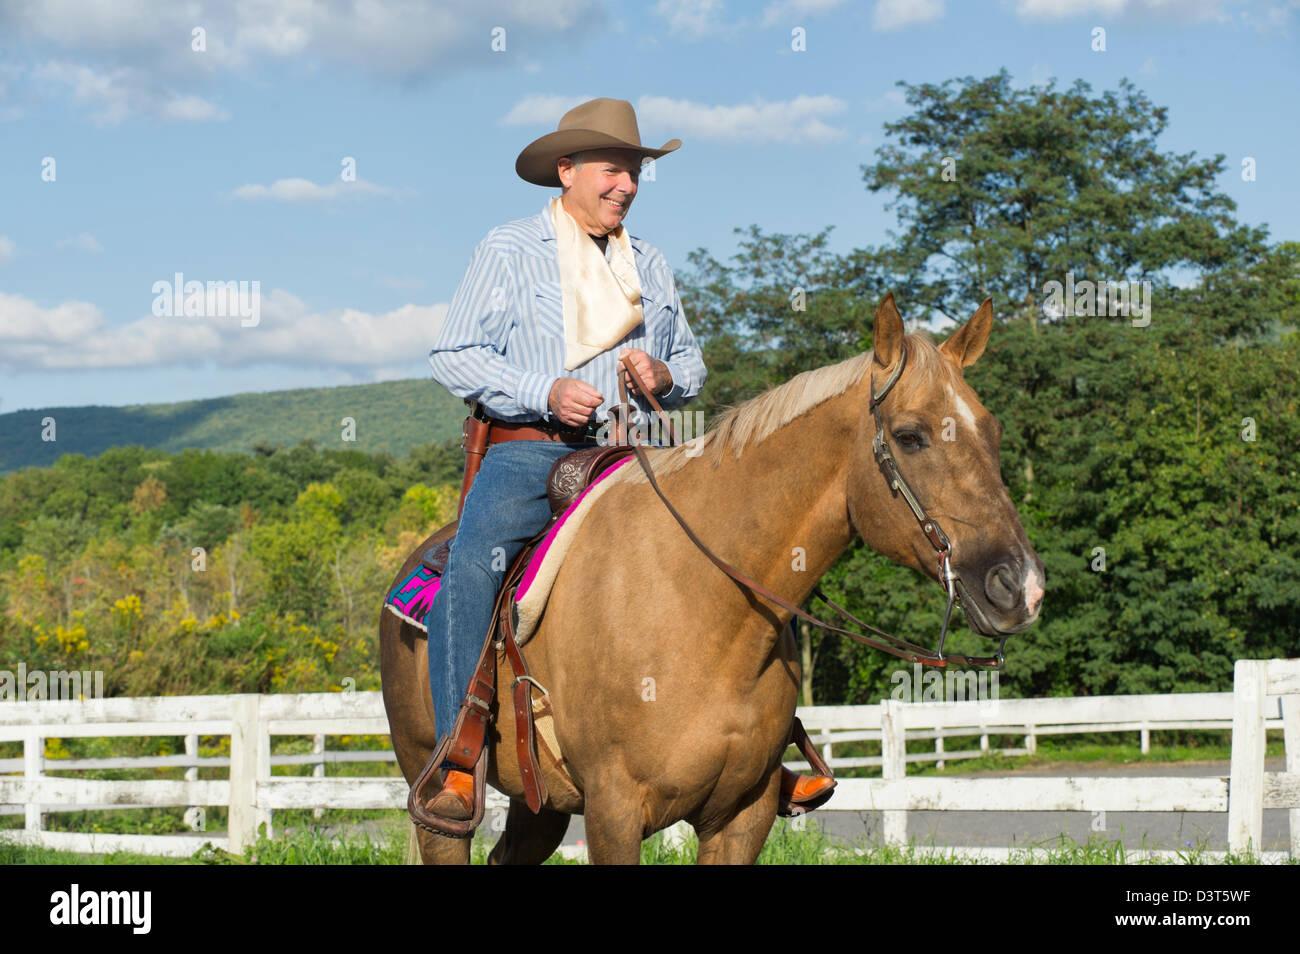 horse riding hat man stock photos & horse riding hat man stock